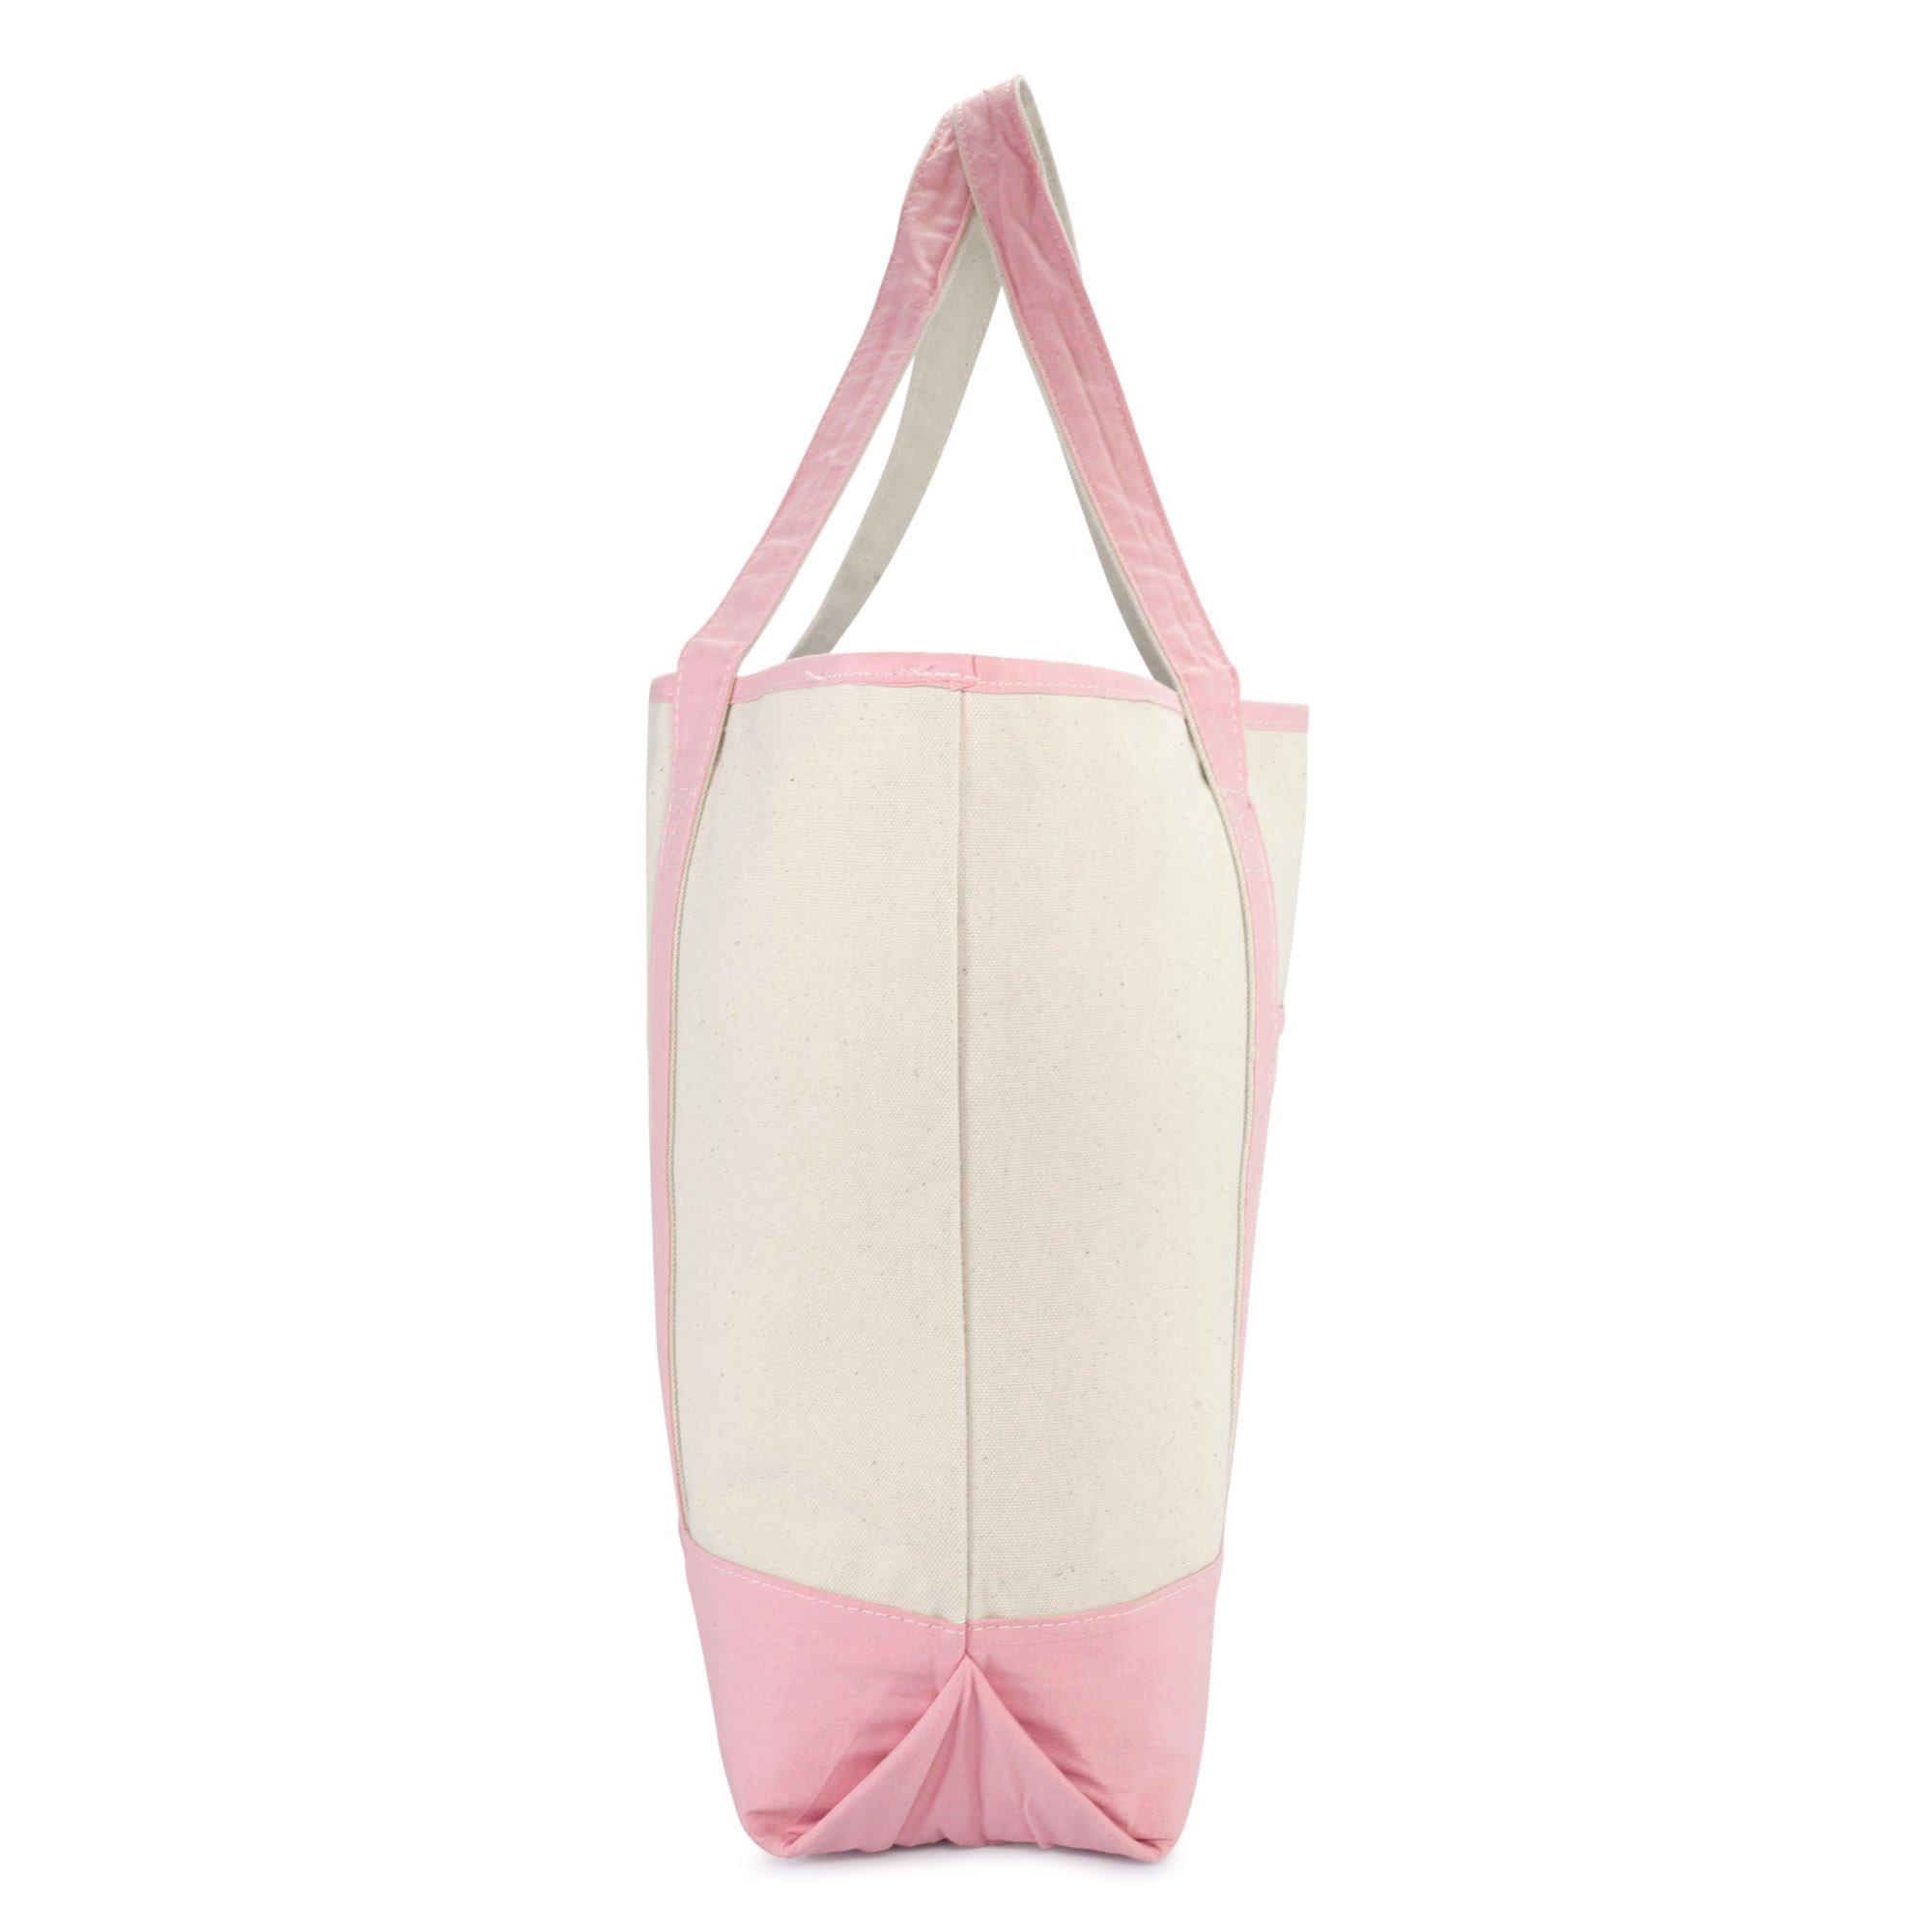 DALIX Women's Cotton Canvas Tote Bag Large Shoulder Bags Pink Monogram G by DALIX (Image #6)